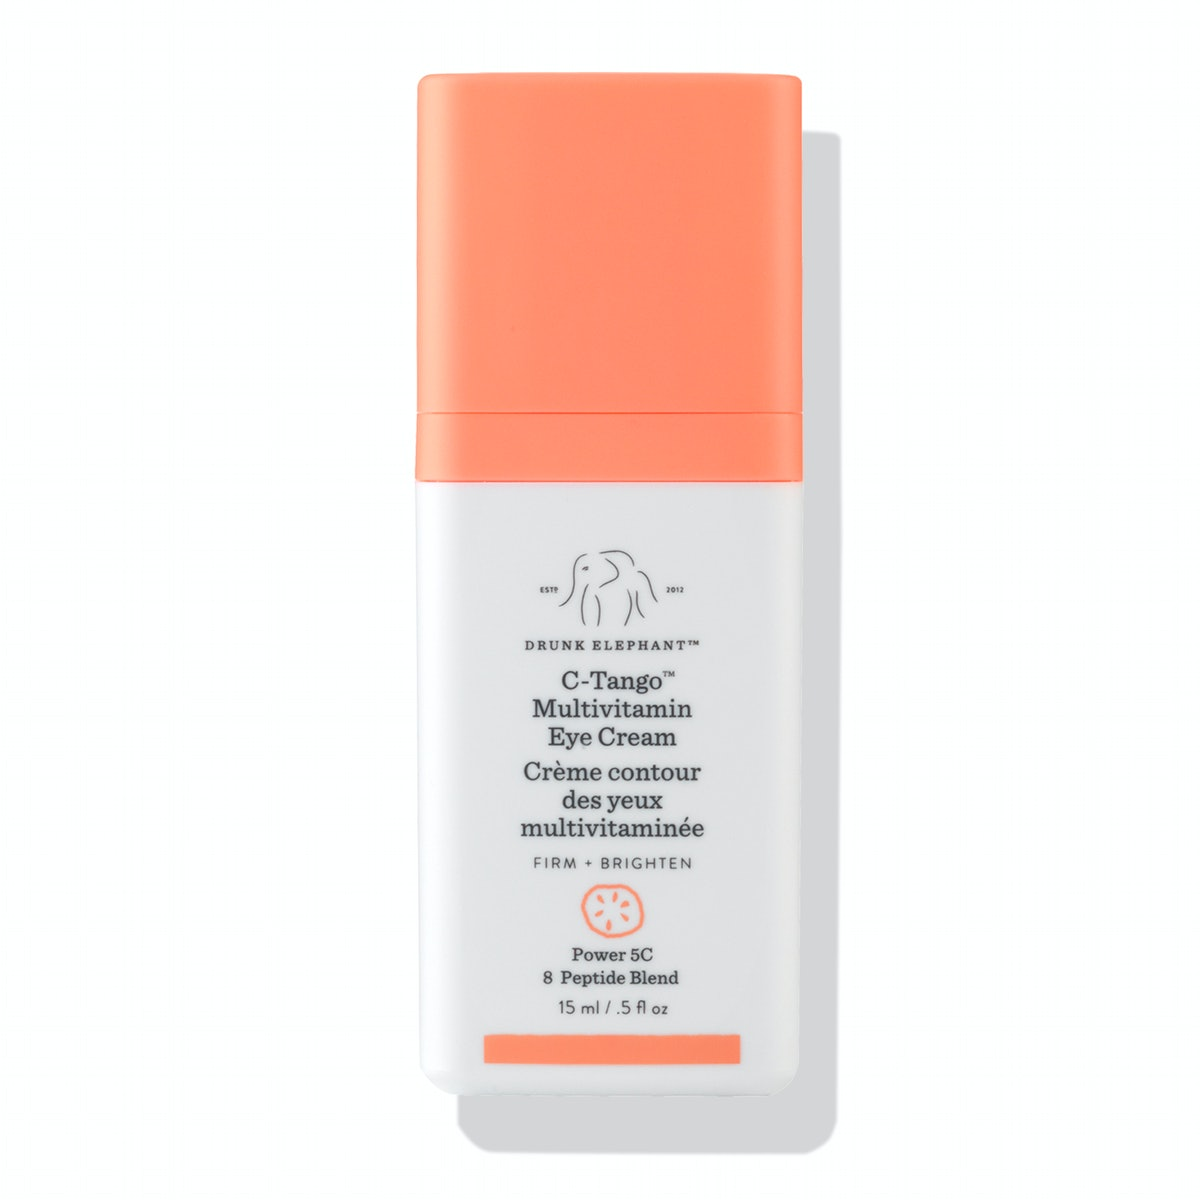 C-Tango Multivitamin Eye Cream